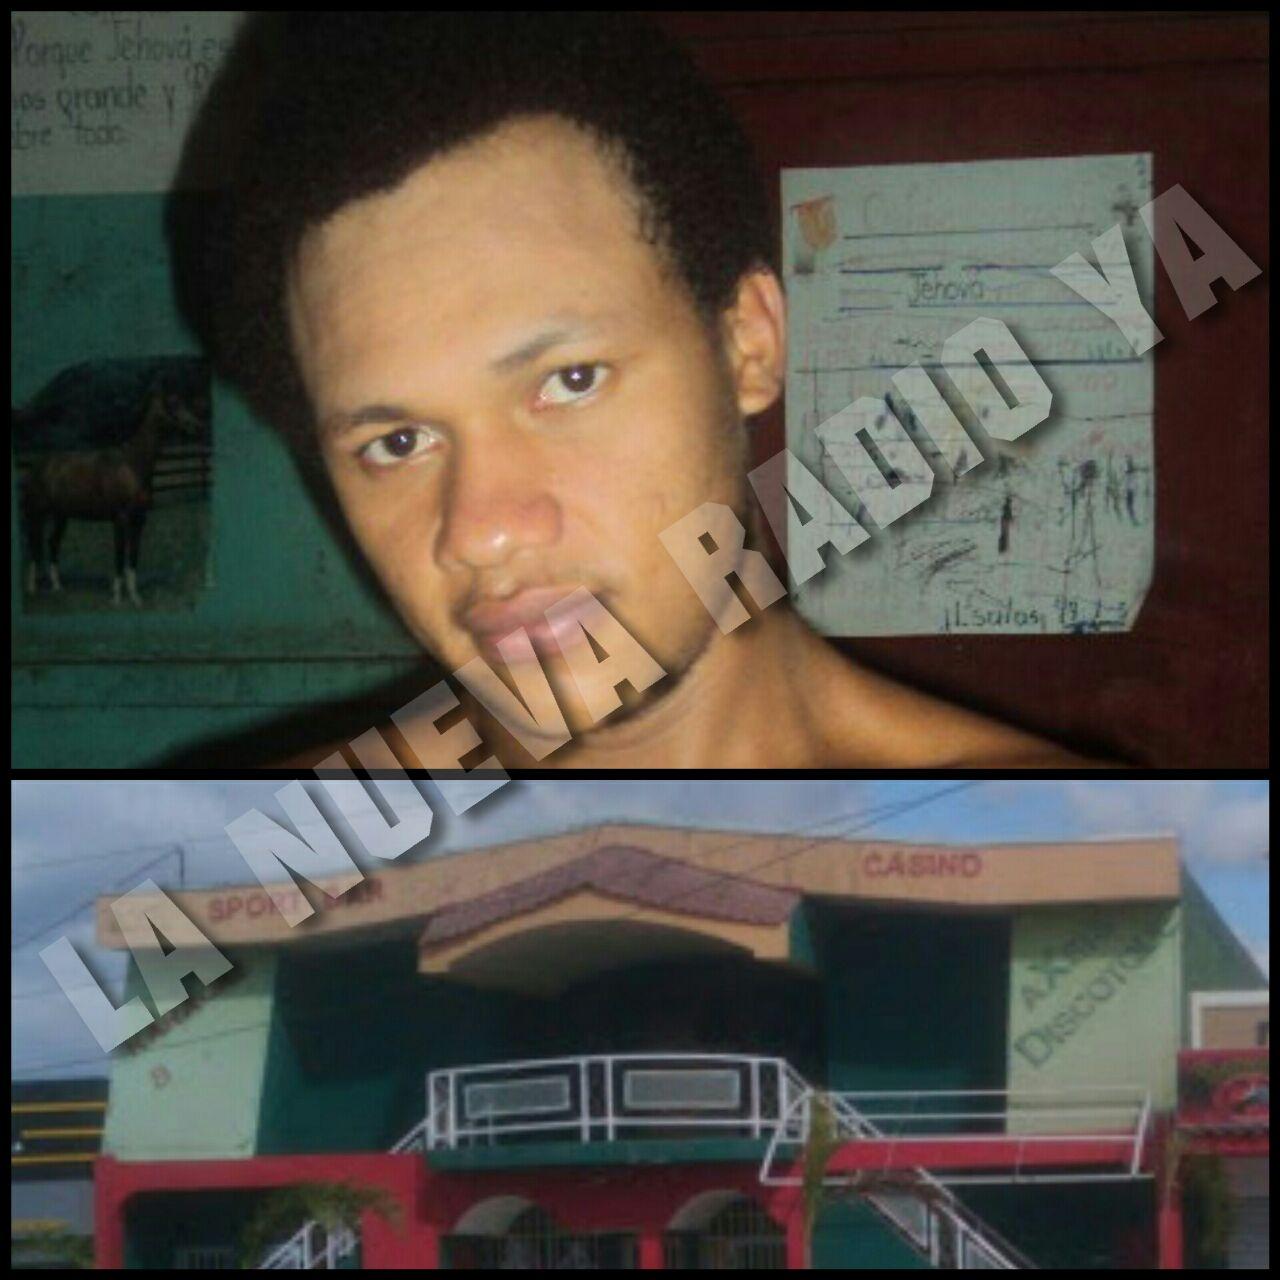 Falleció repentinamente el joven Atking Wilfredo Wilson Peralta